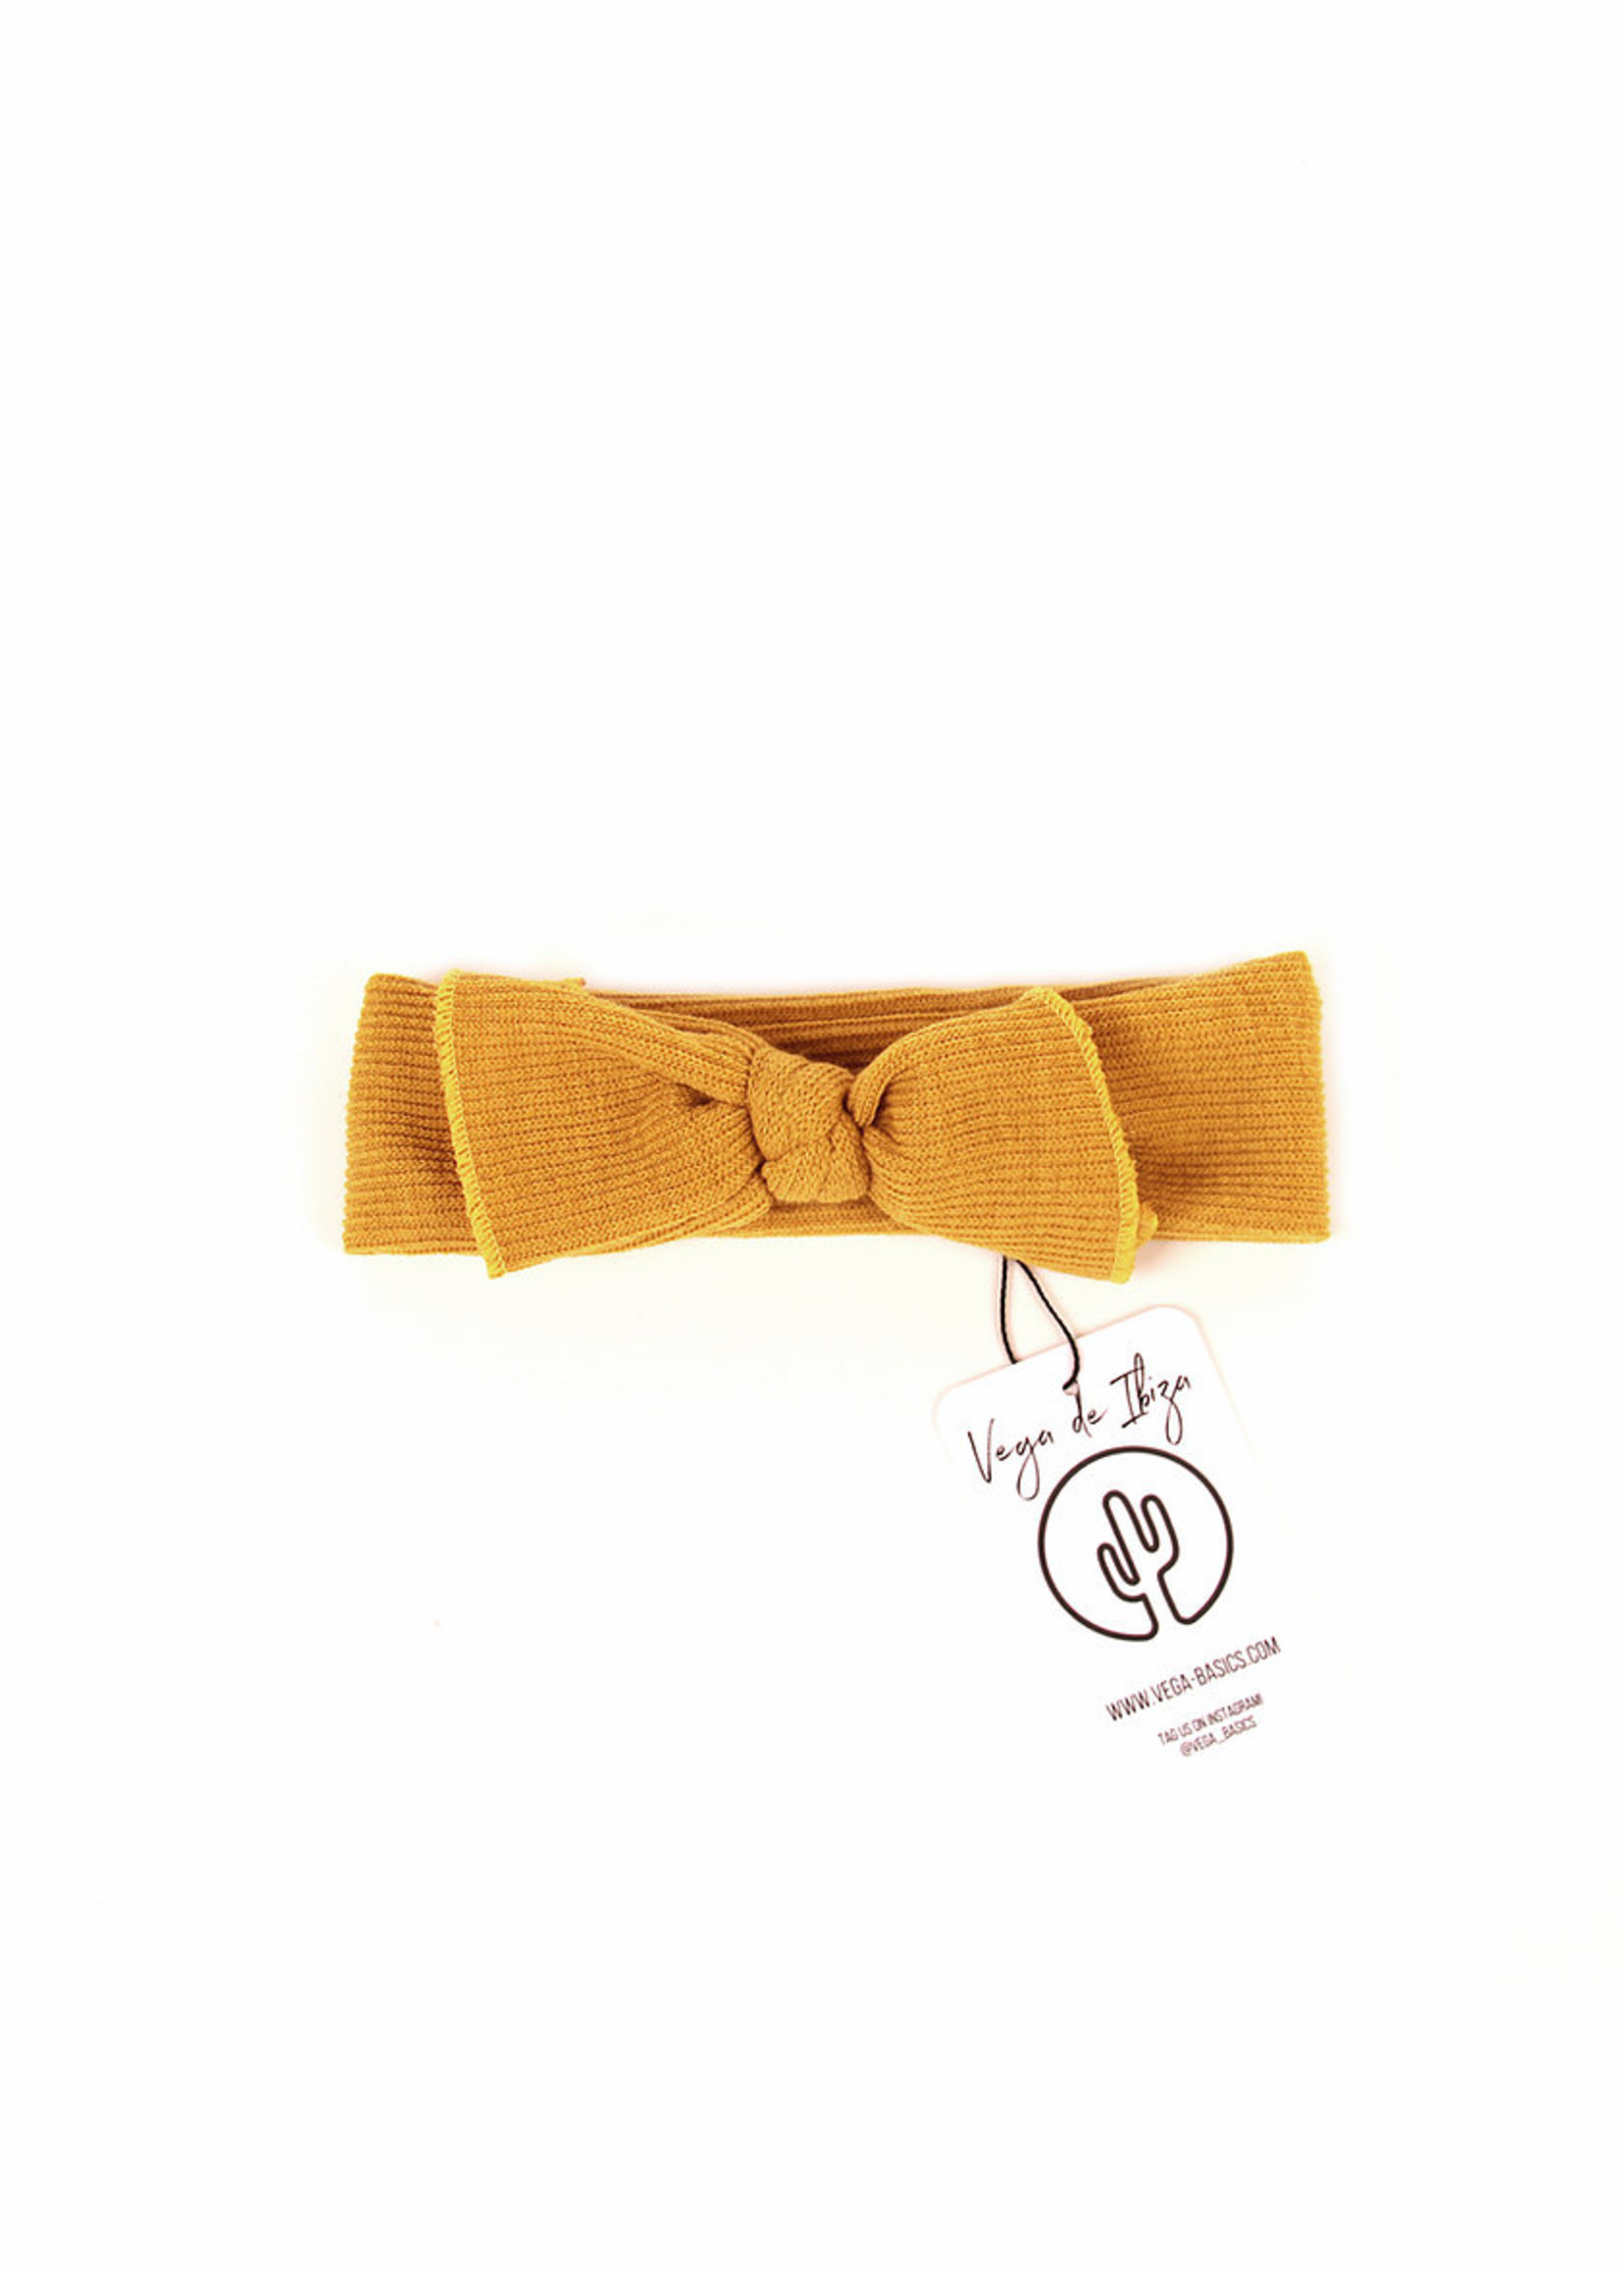 Vega Basics The Suave - Saffron